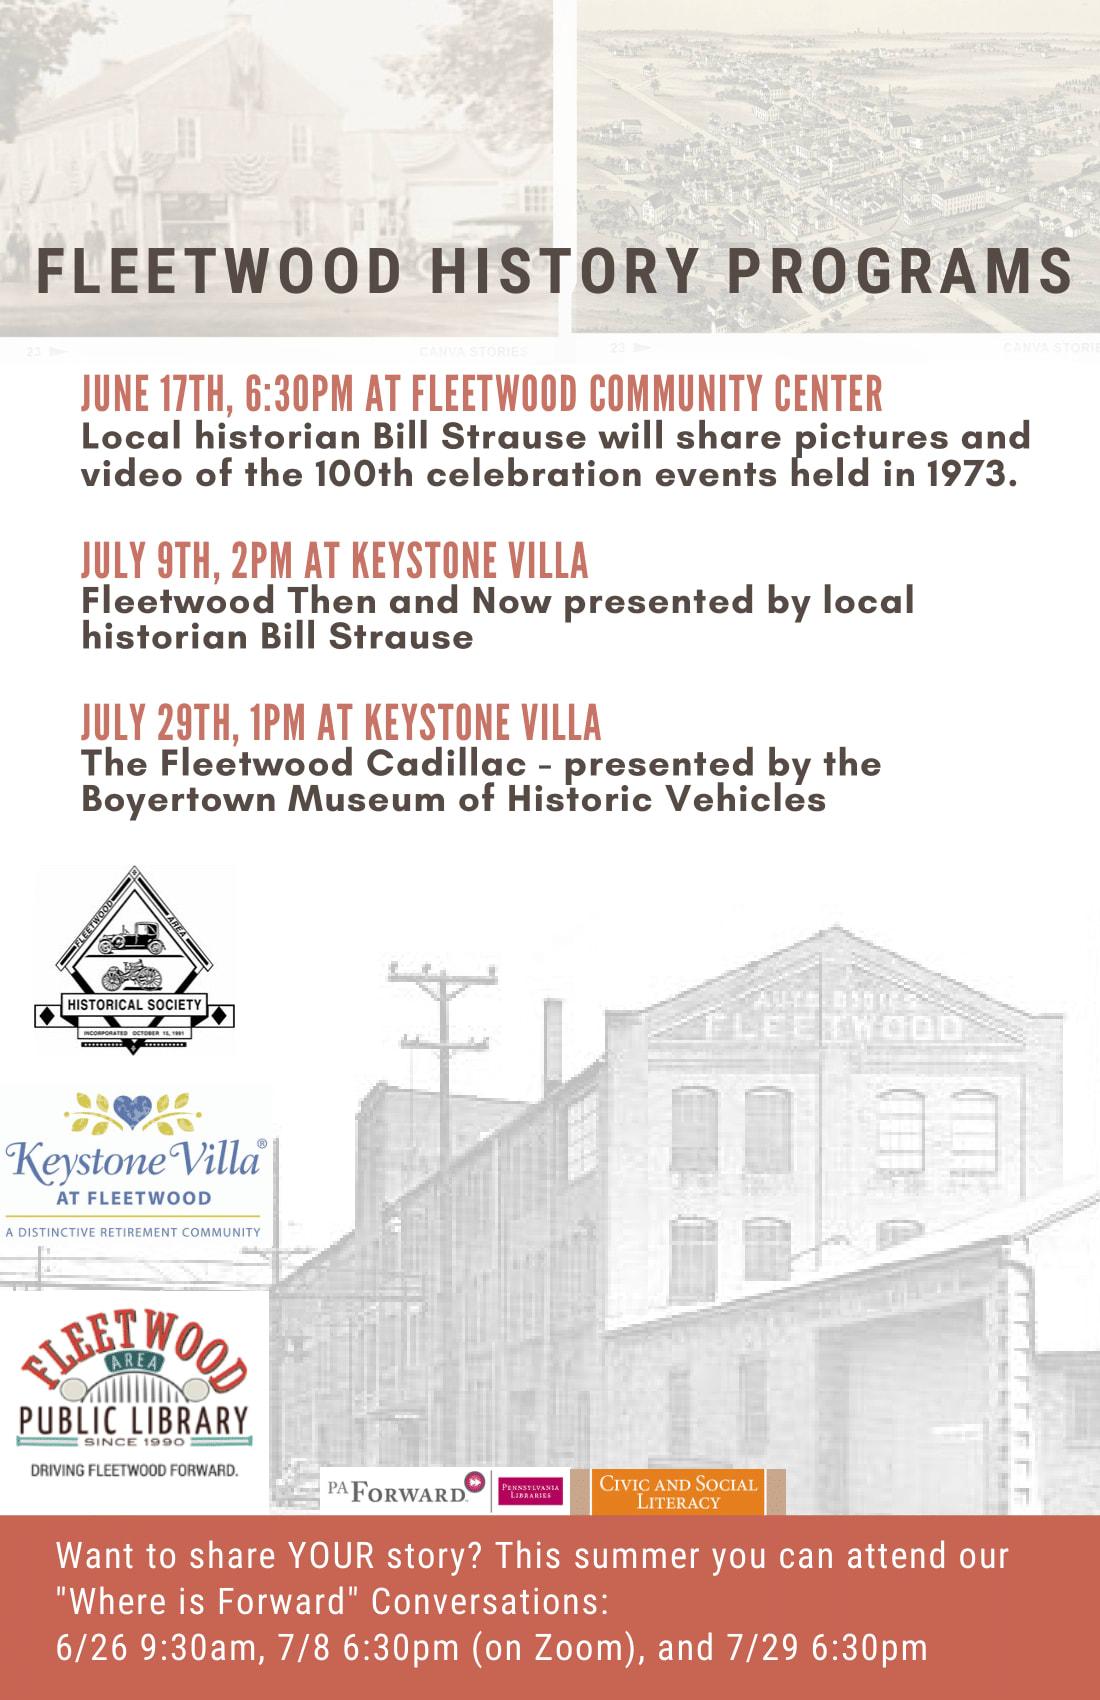 Fleetwood History Programs Flyer